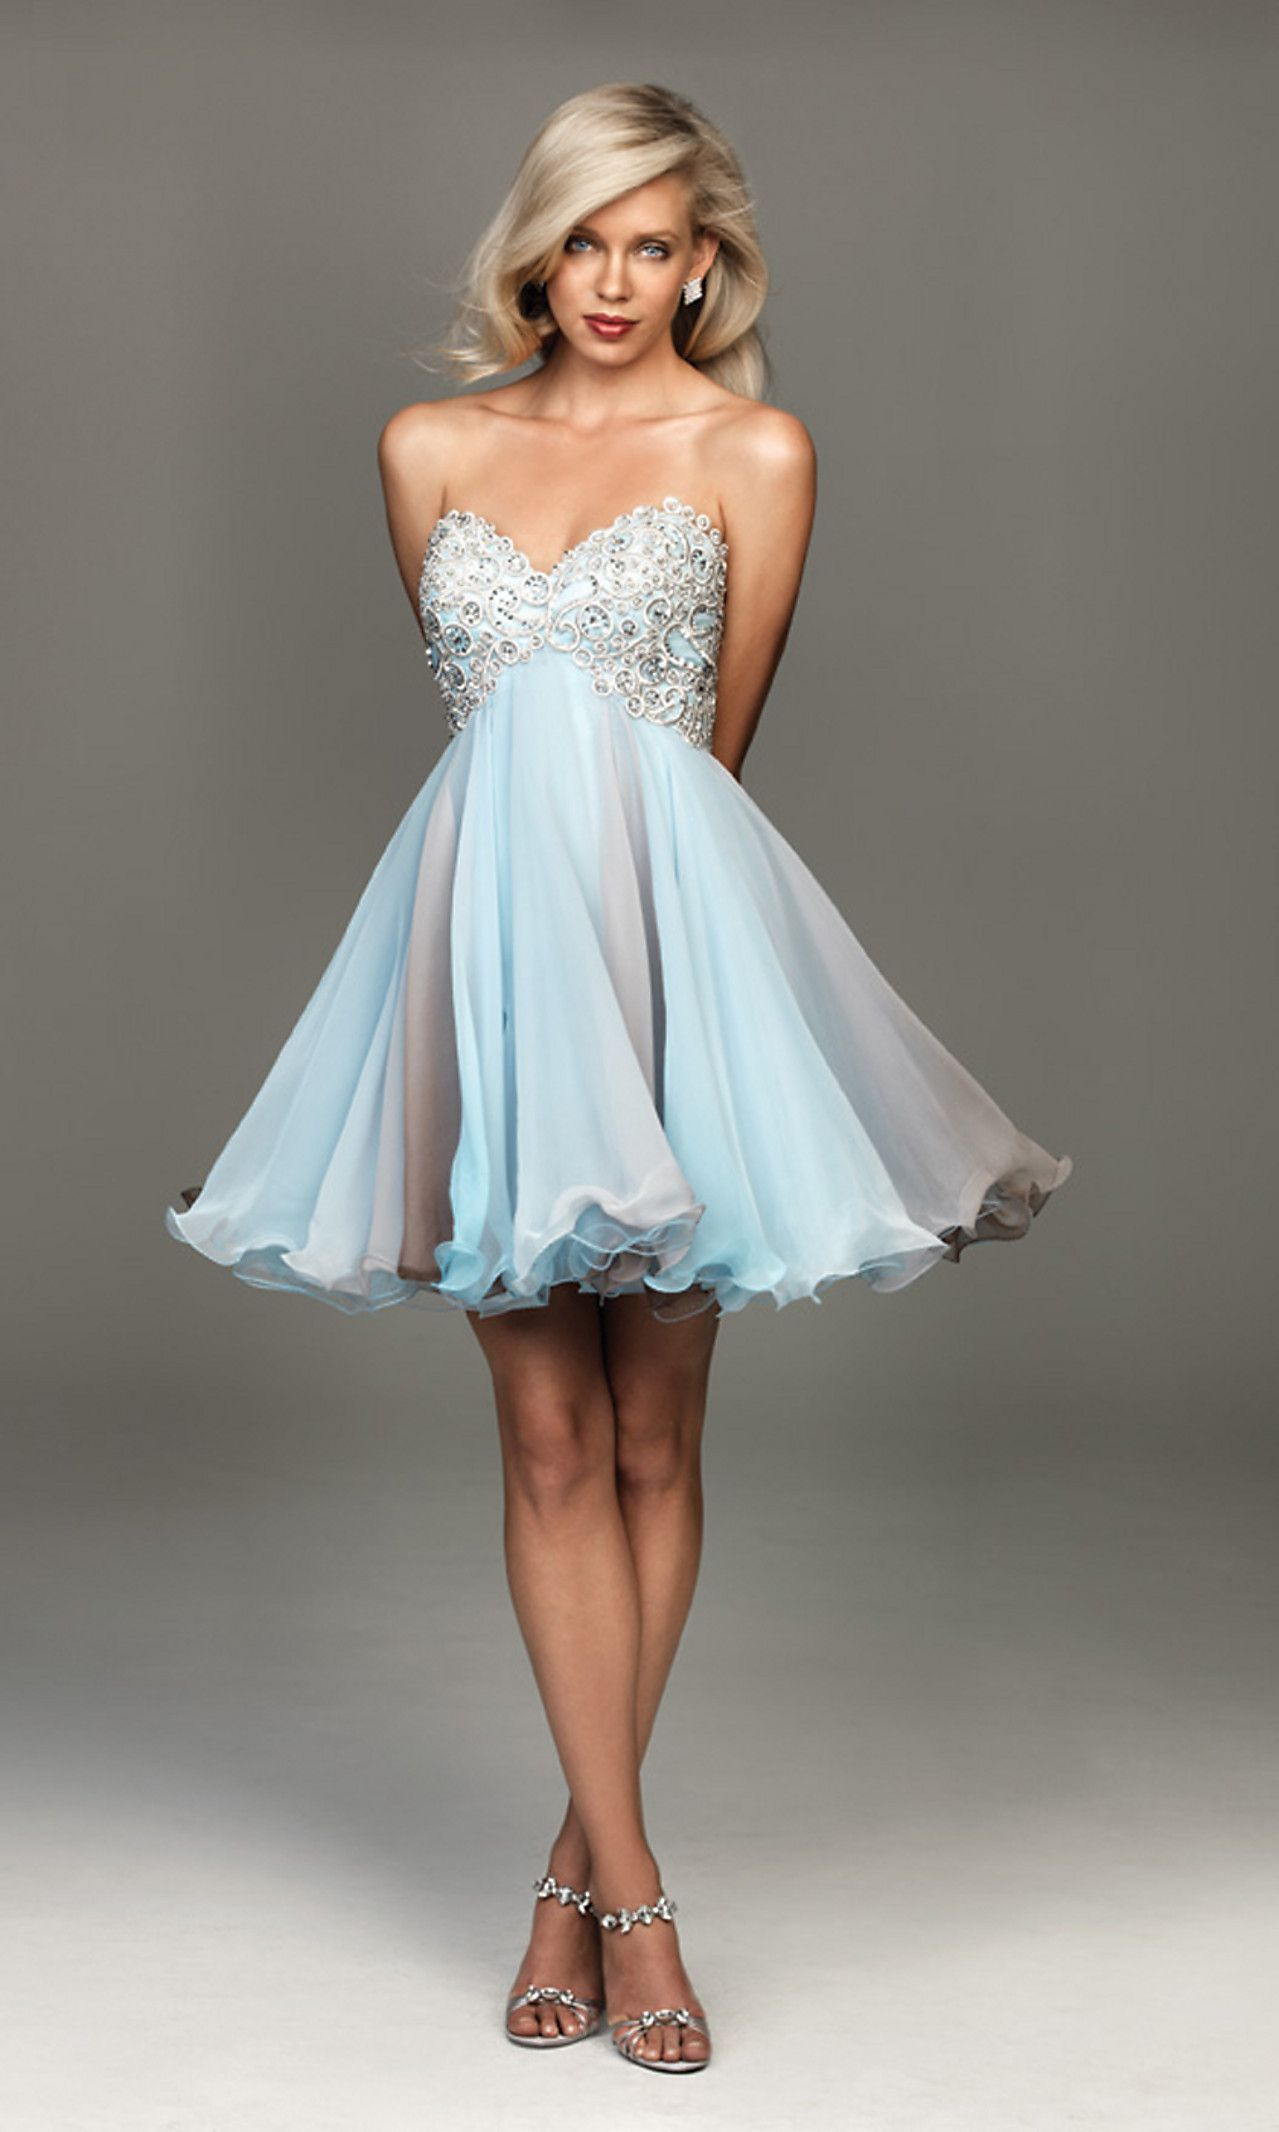 Short Blue Strapless Madison James Party Dress